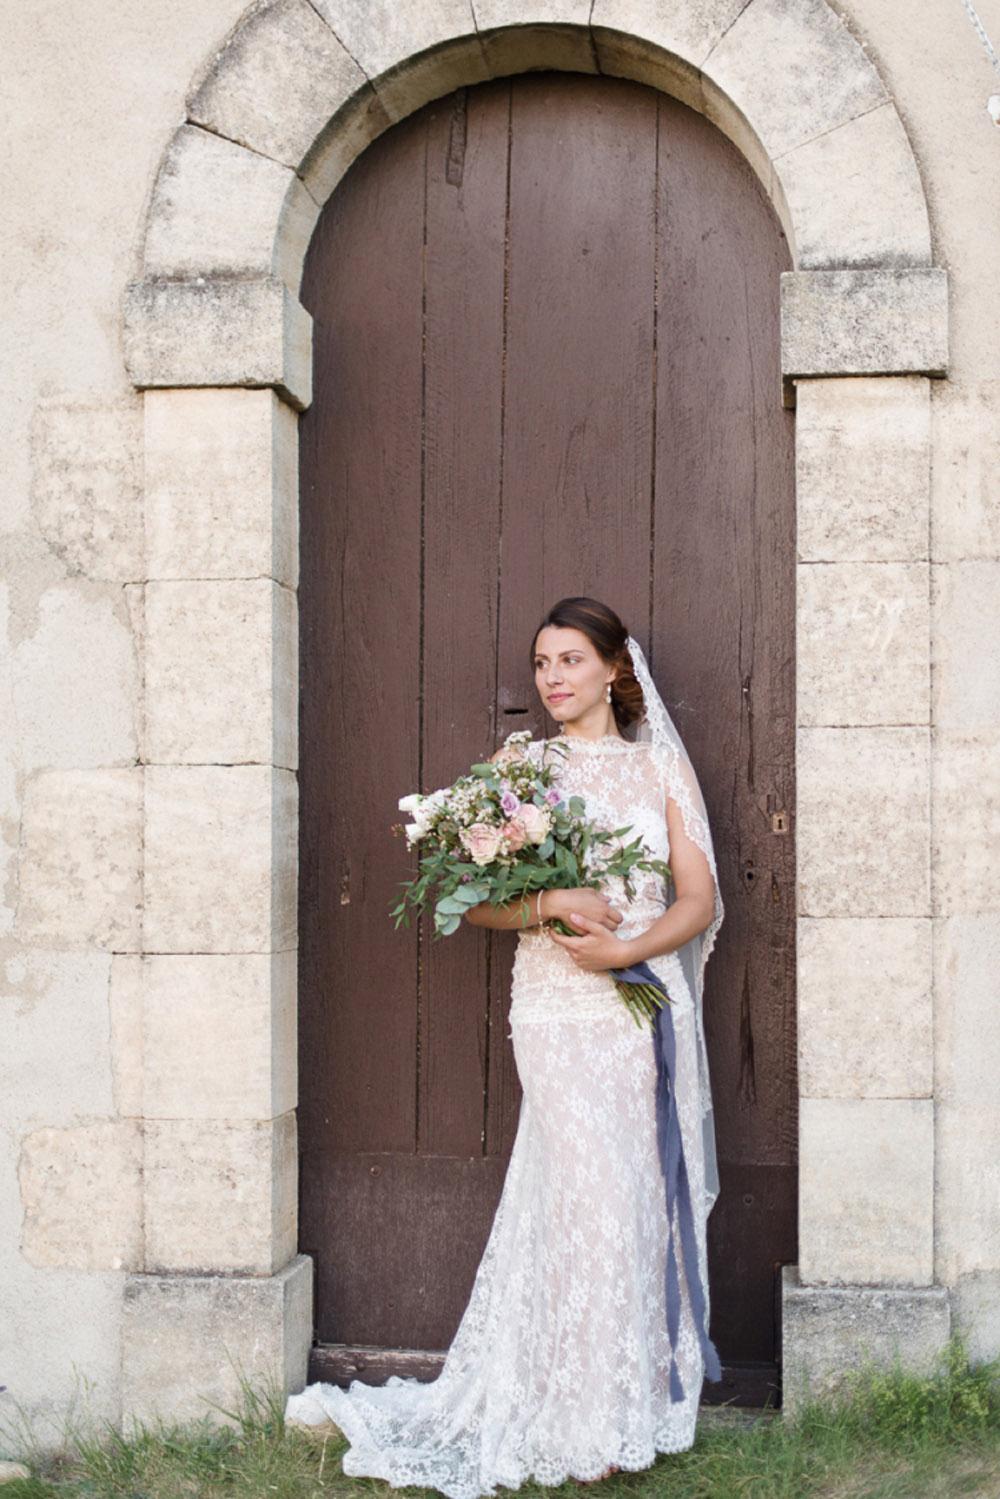 8-quiqui-lamothe-designer-robes-de-mariees-de-provence-eglise-robe-mariee-boheme-dentelle-dos-nu-mar